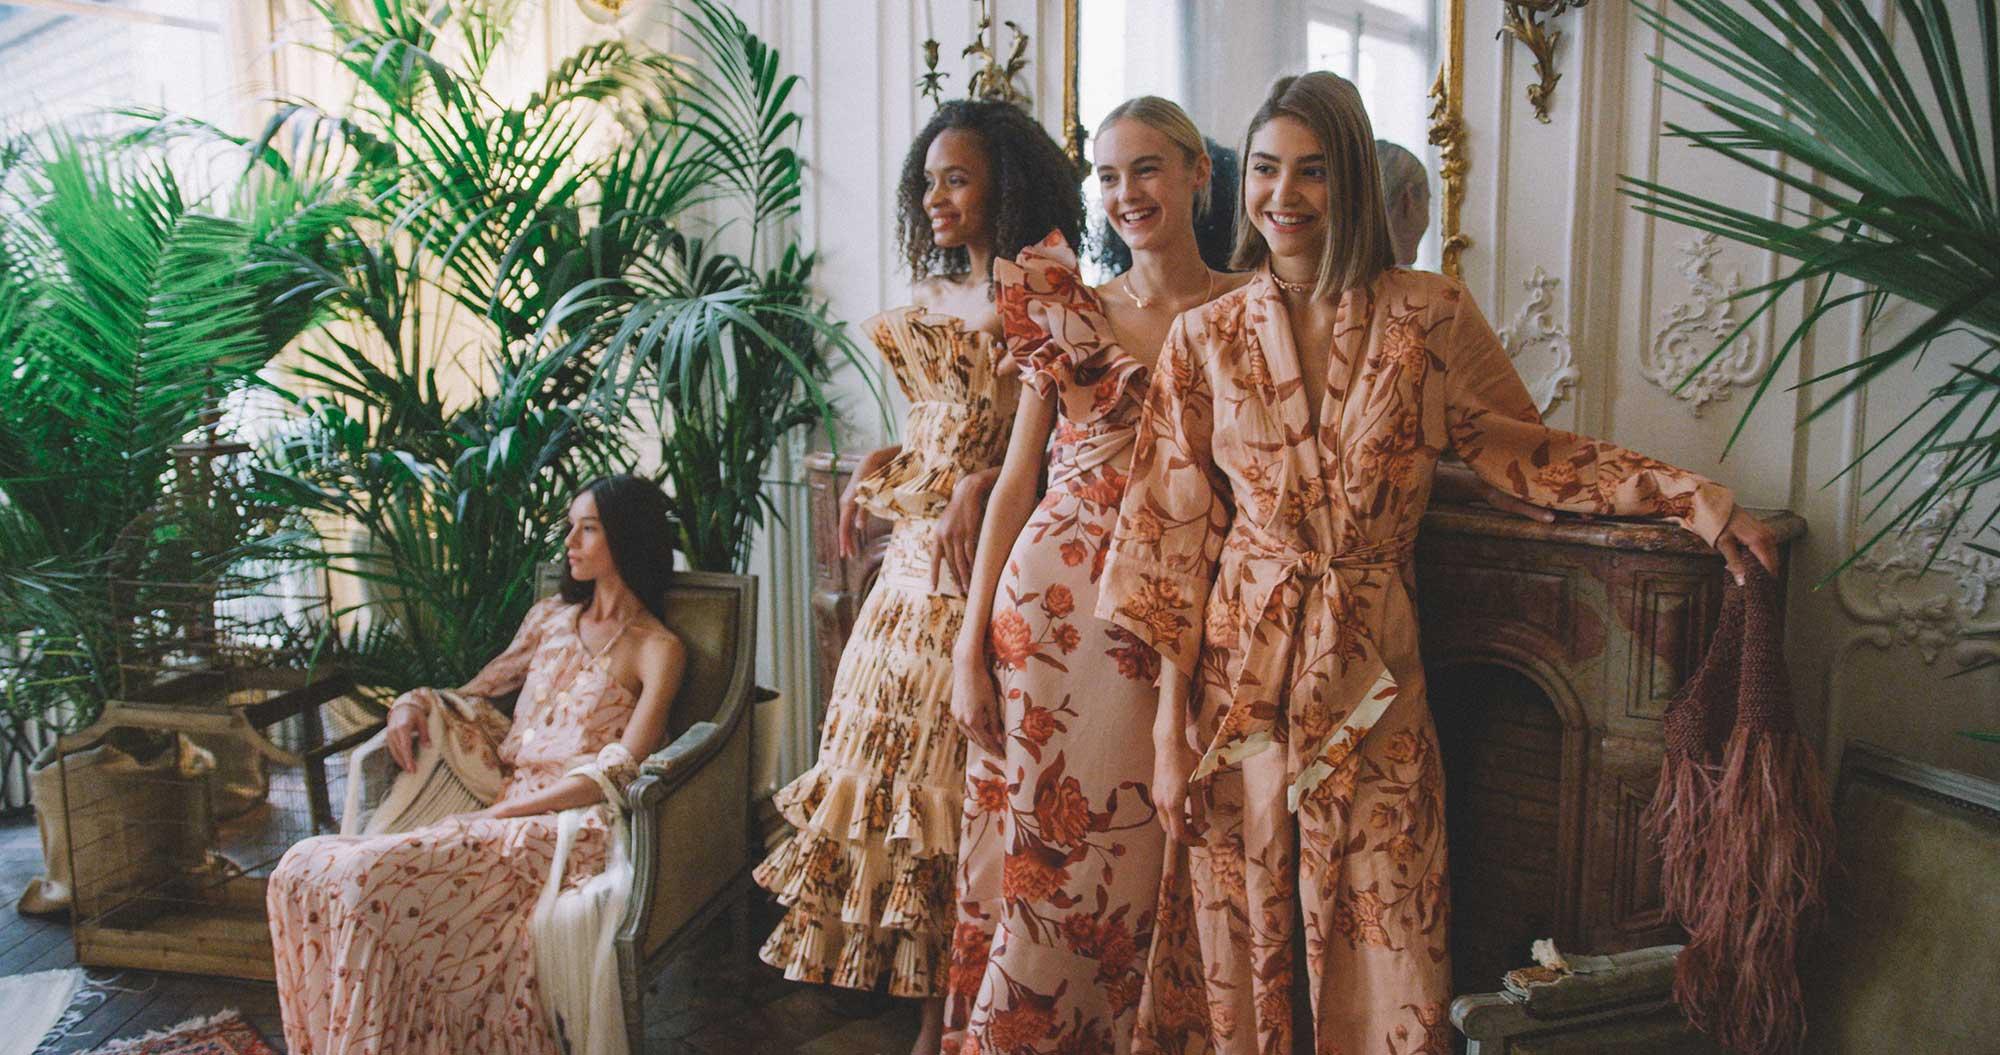 Johanna Ortiz Spring Summer 2019 Presentation Paris Fashion Week33.jpg